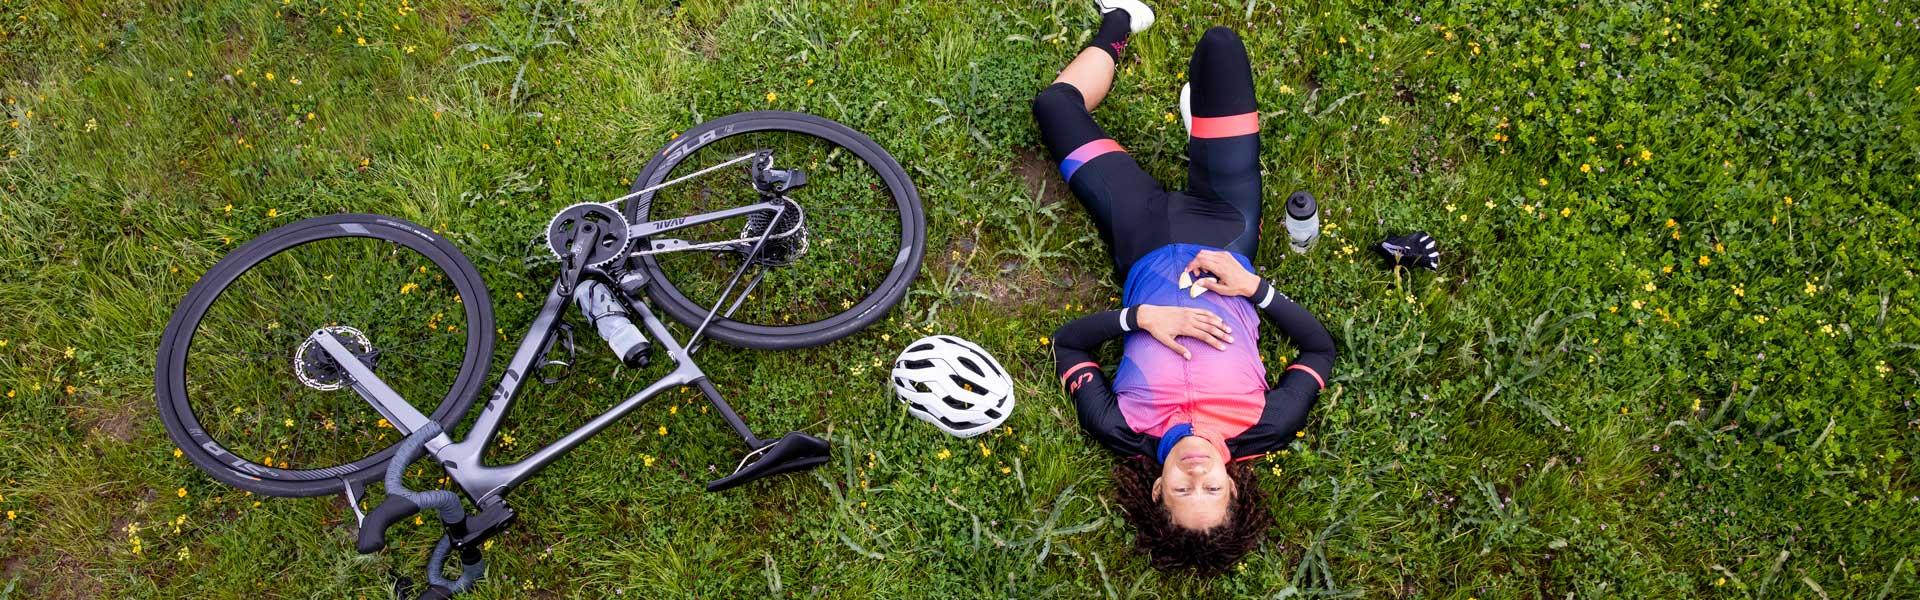 Liv Women's Cycling Apparel